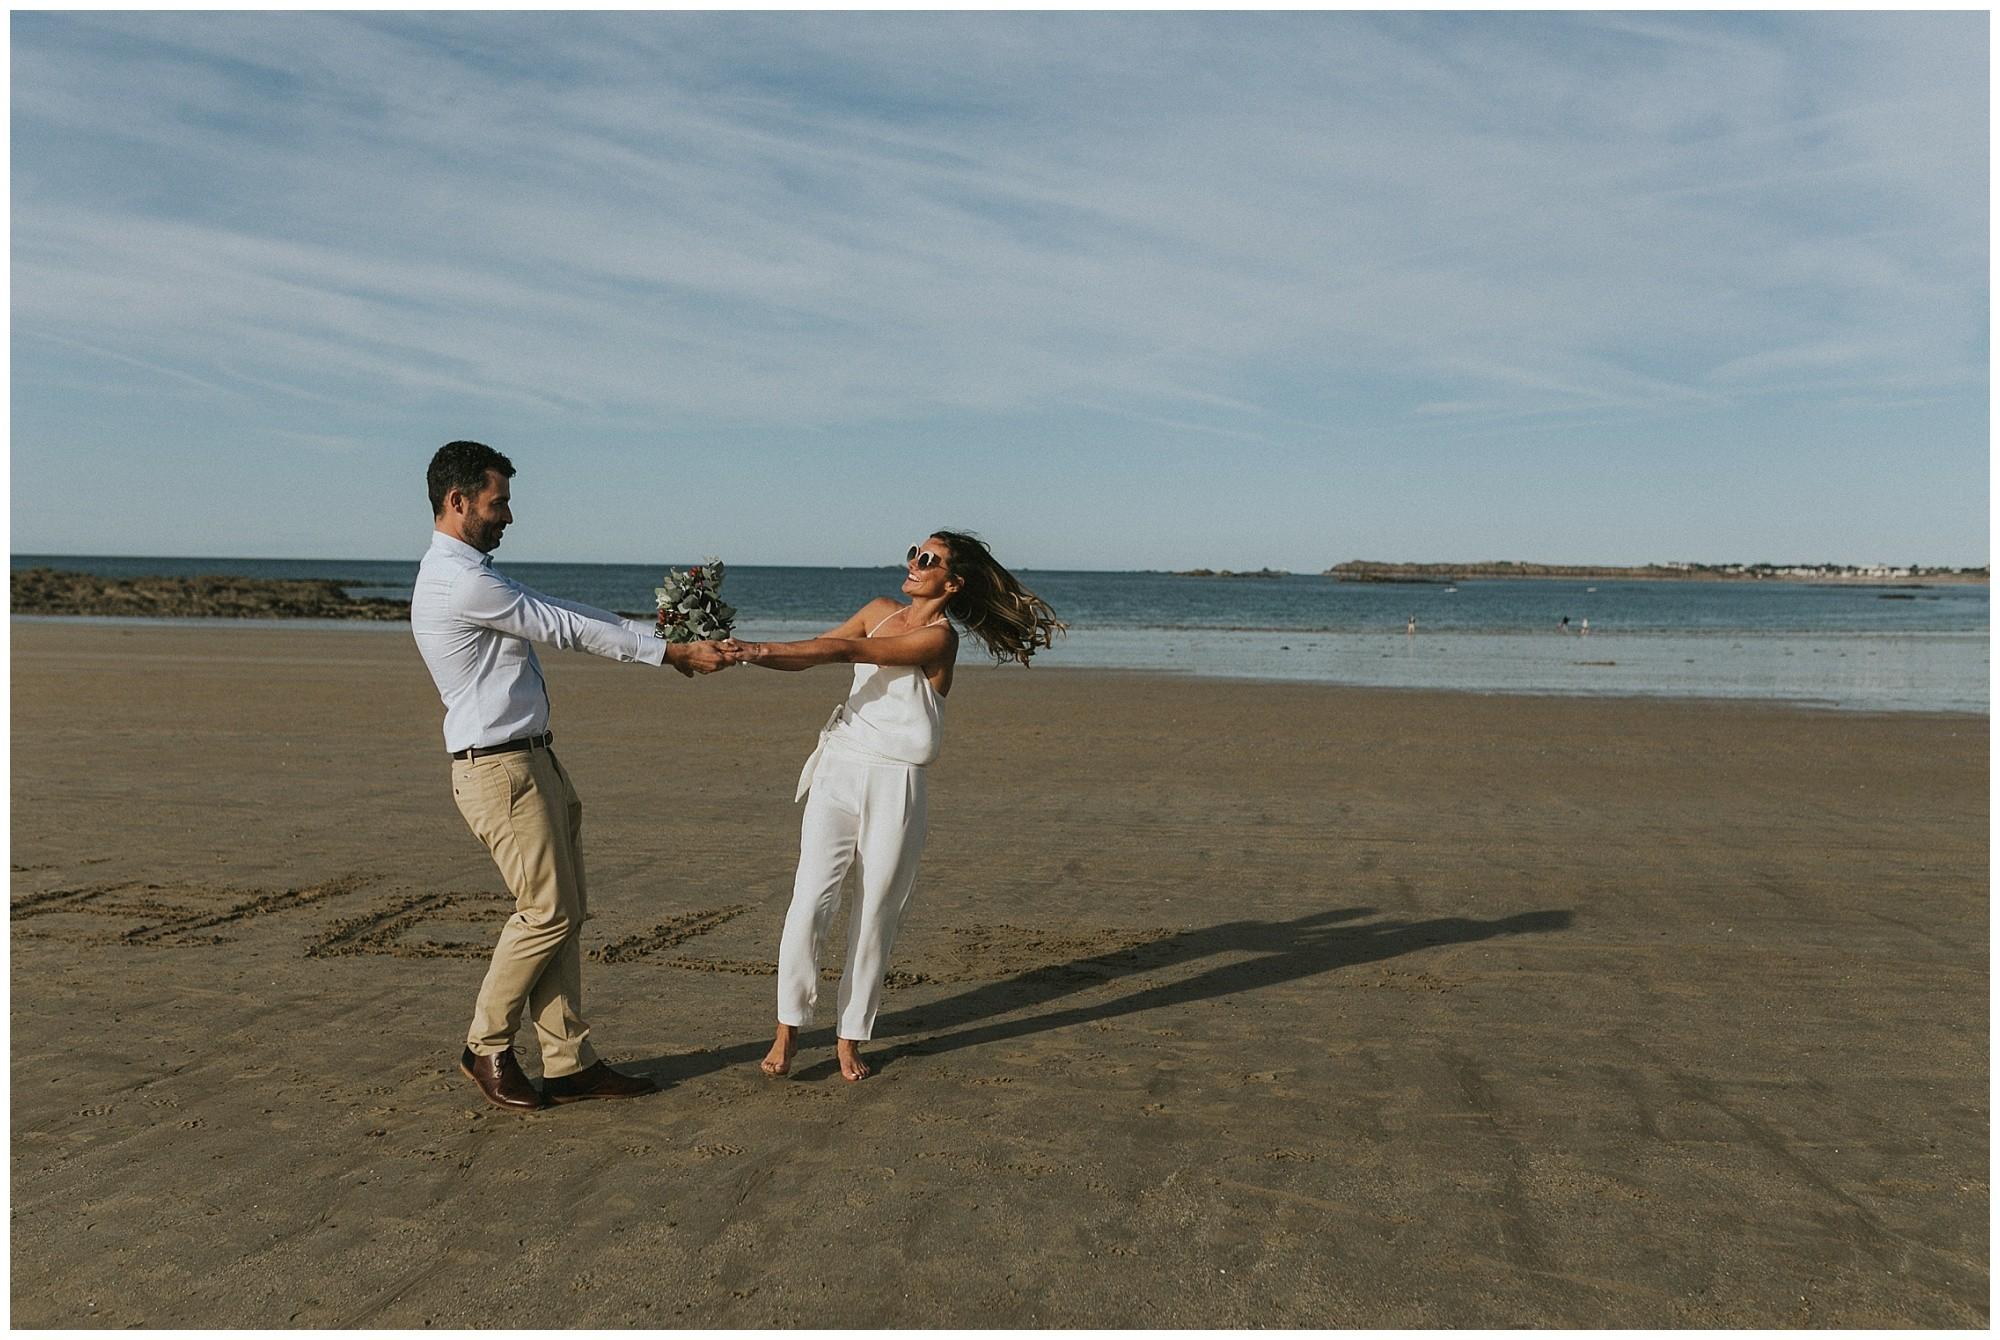 Kateryna-photos-photographe-mariage-bretagne-saint-malo-finistere-cotes-darmor-wedding_0059.jpg